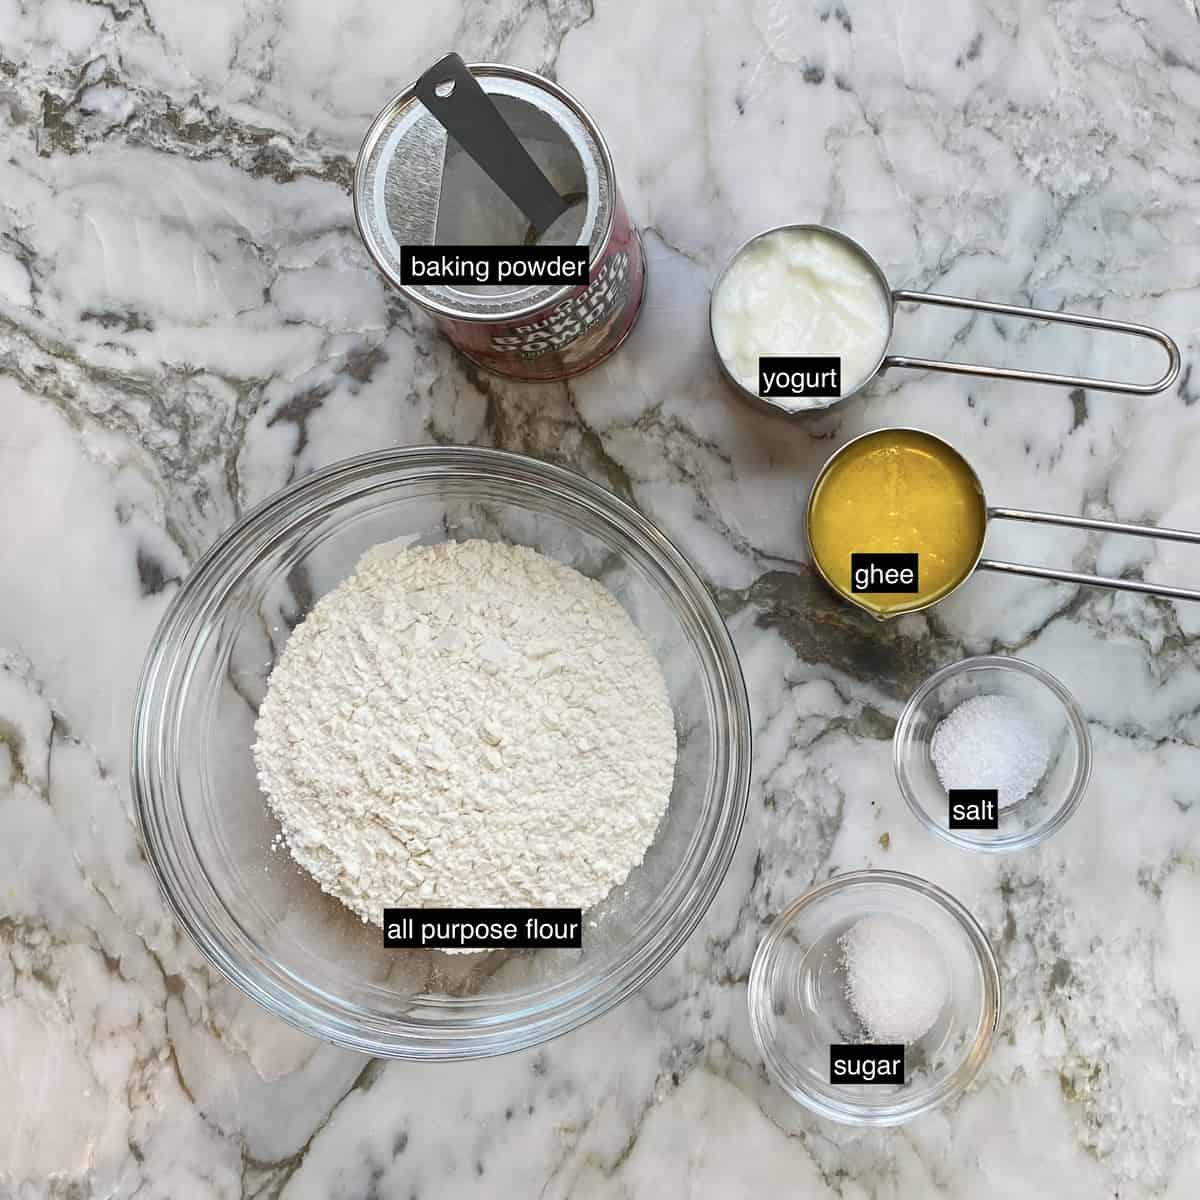 balushahi dry ingredients